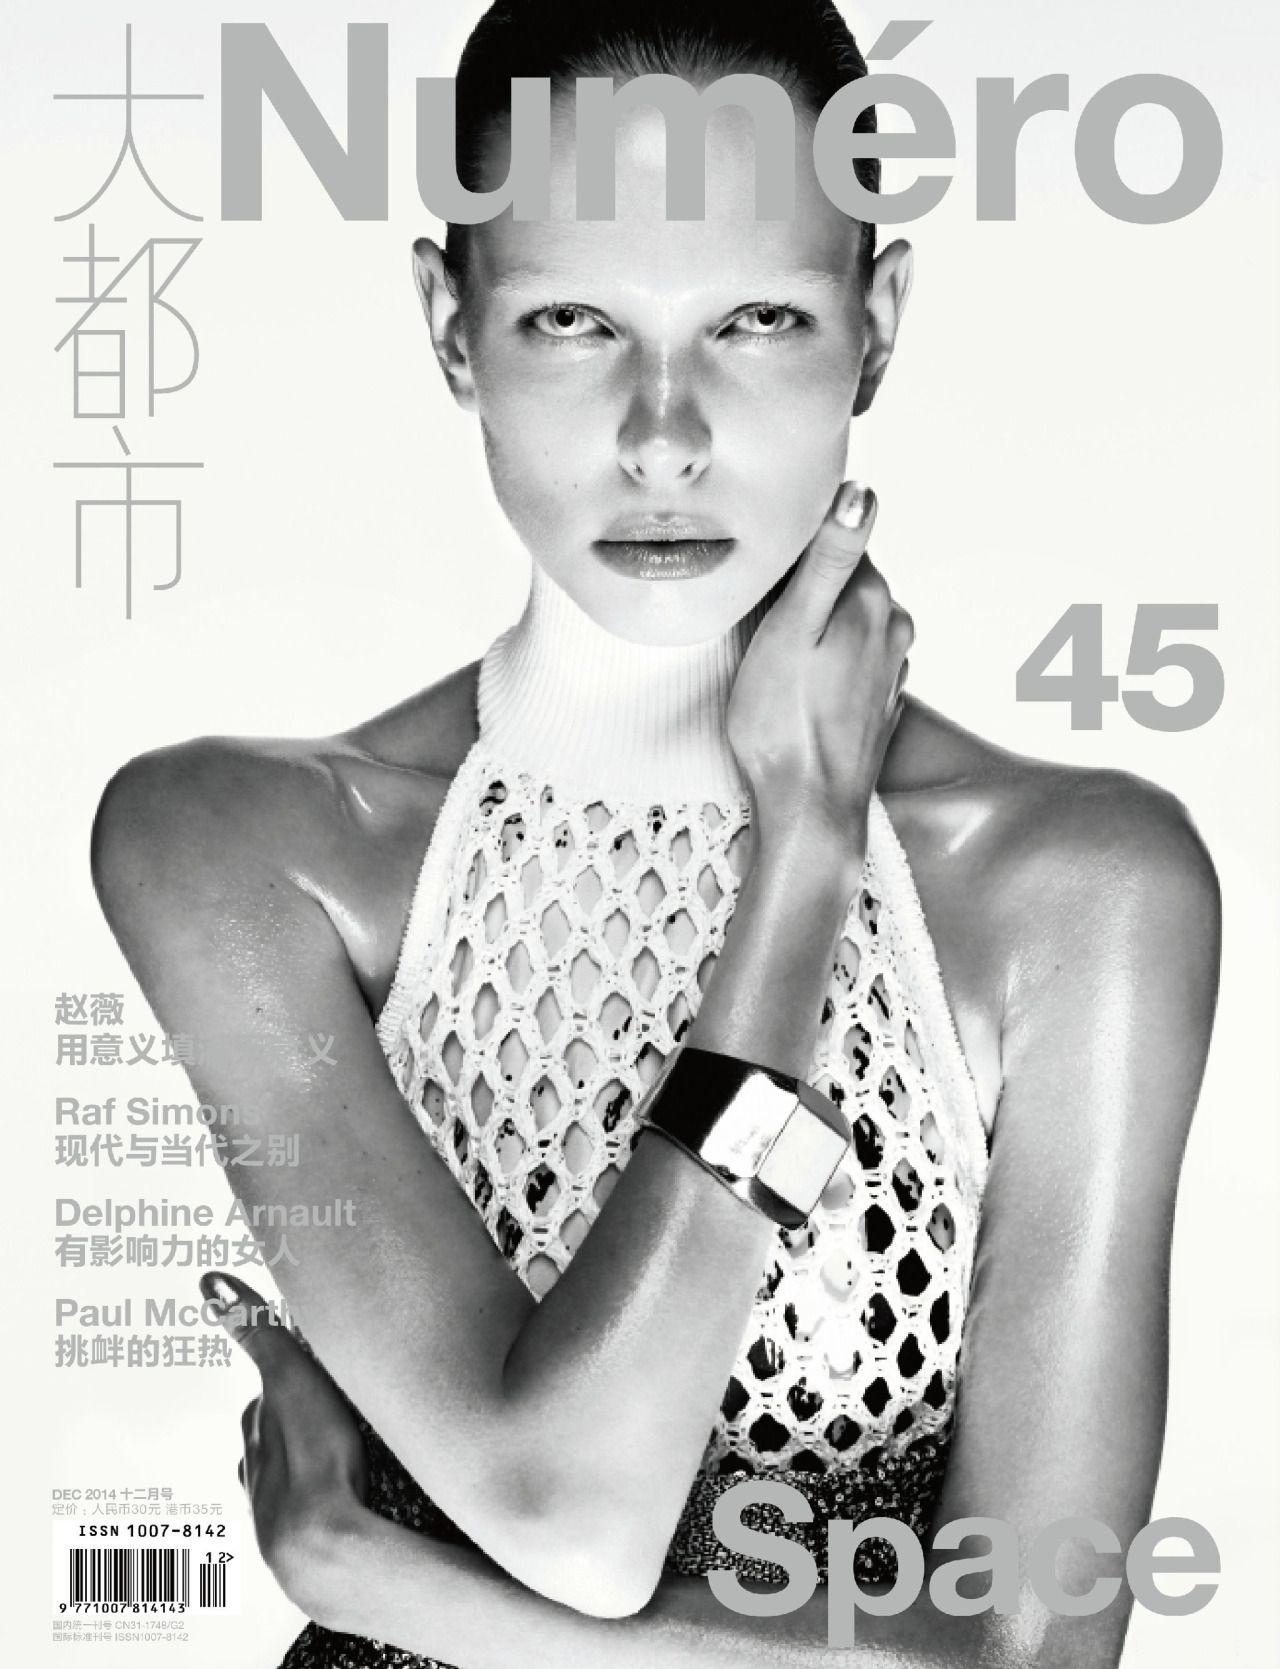 Lina Berg by Anthony Maule for Numéro China #45 December 2014. #fashion